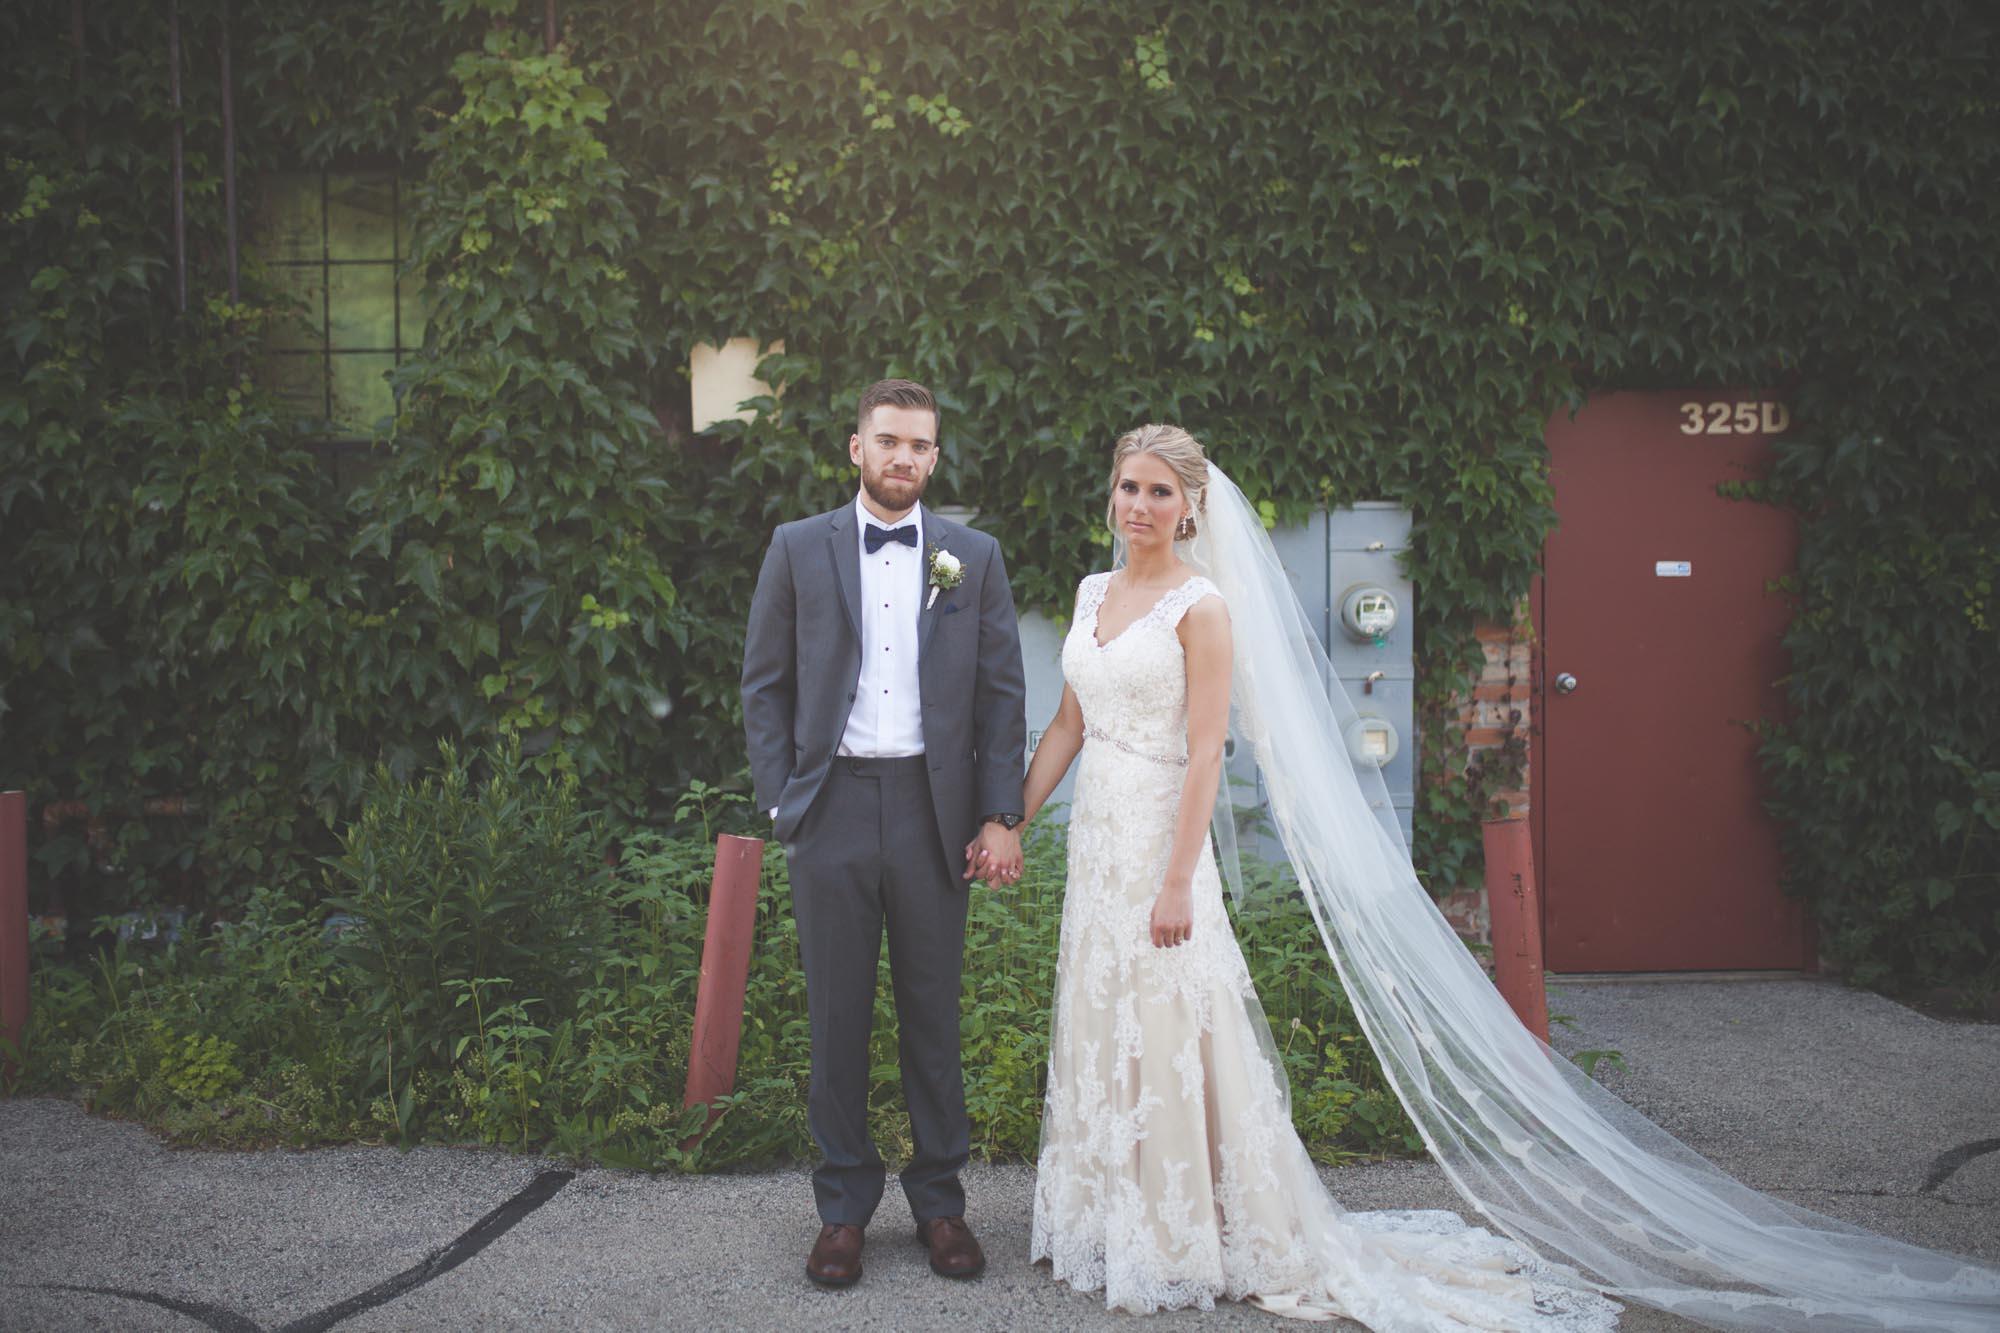 chicago_il_wedding_photography-0626